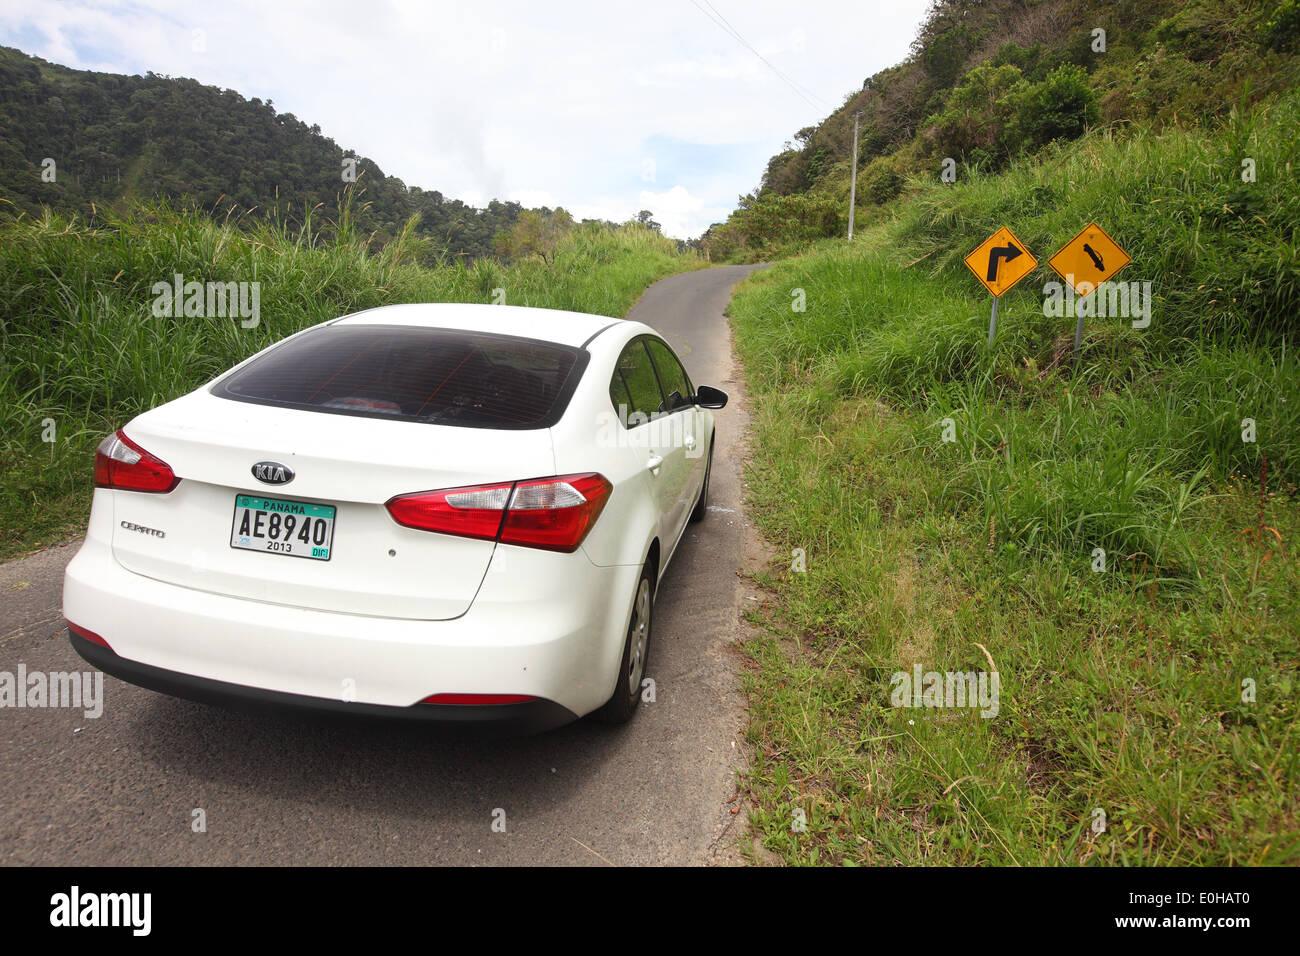 Chiriqui, Bajo Boquete, Boquete, driving along road 17 with rental car, Parque Nacional Volcan Baru, Panama Stock Photo